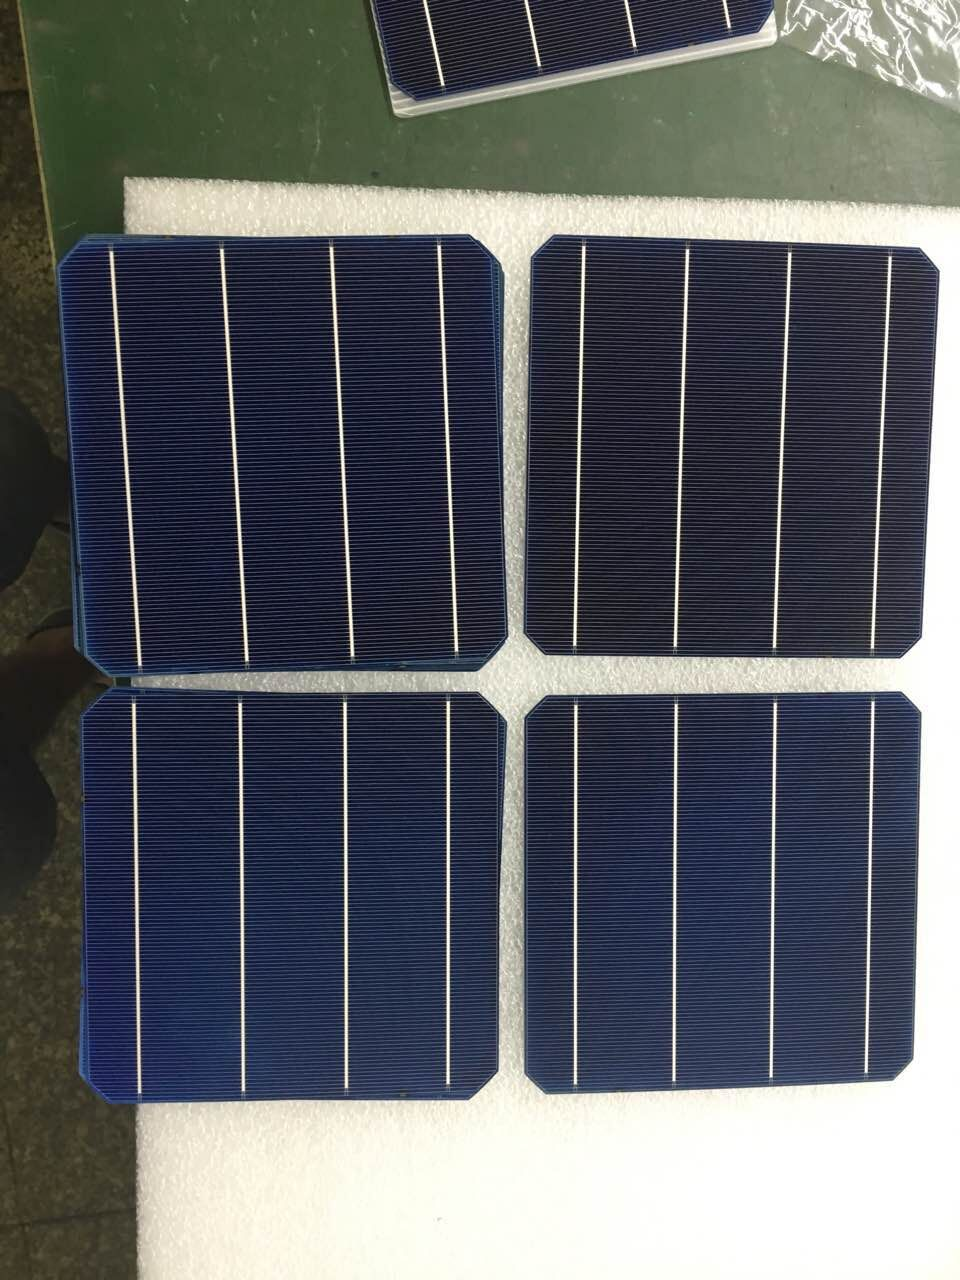 ячейка солнечных батарей цена